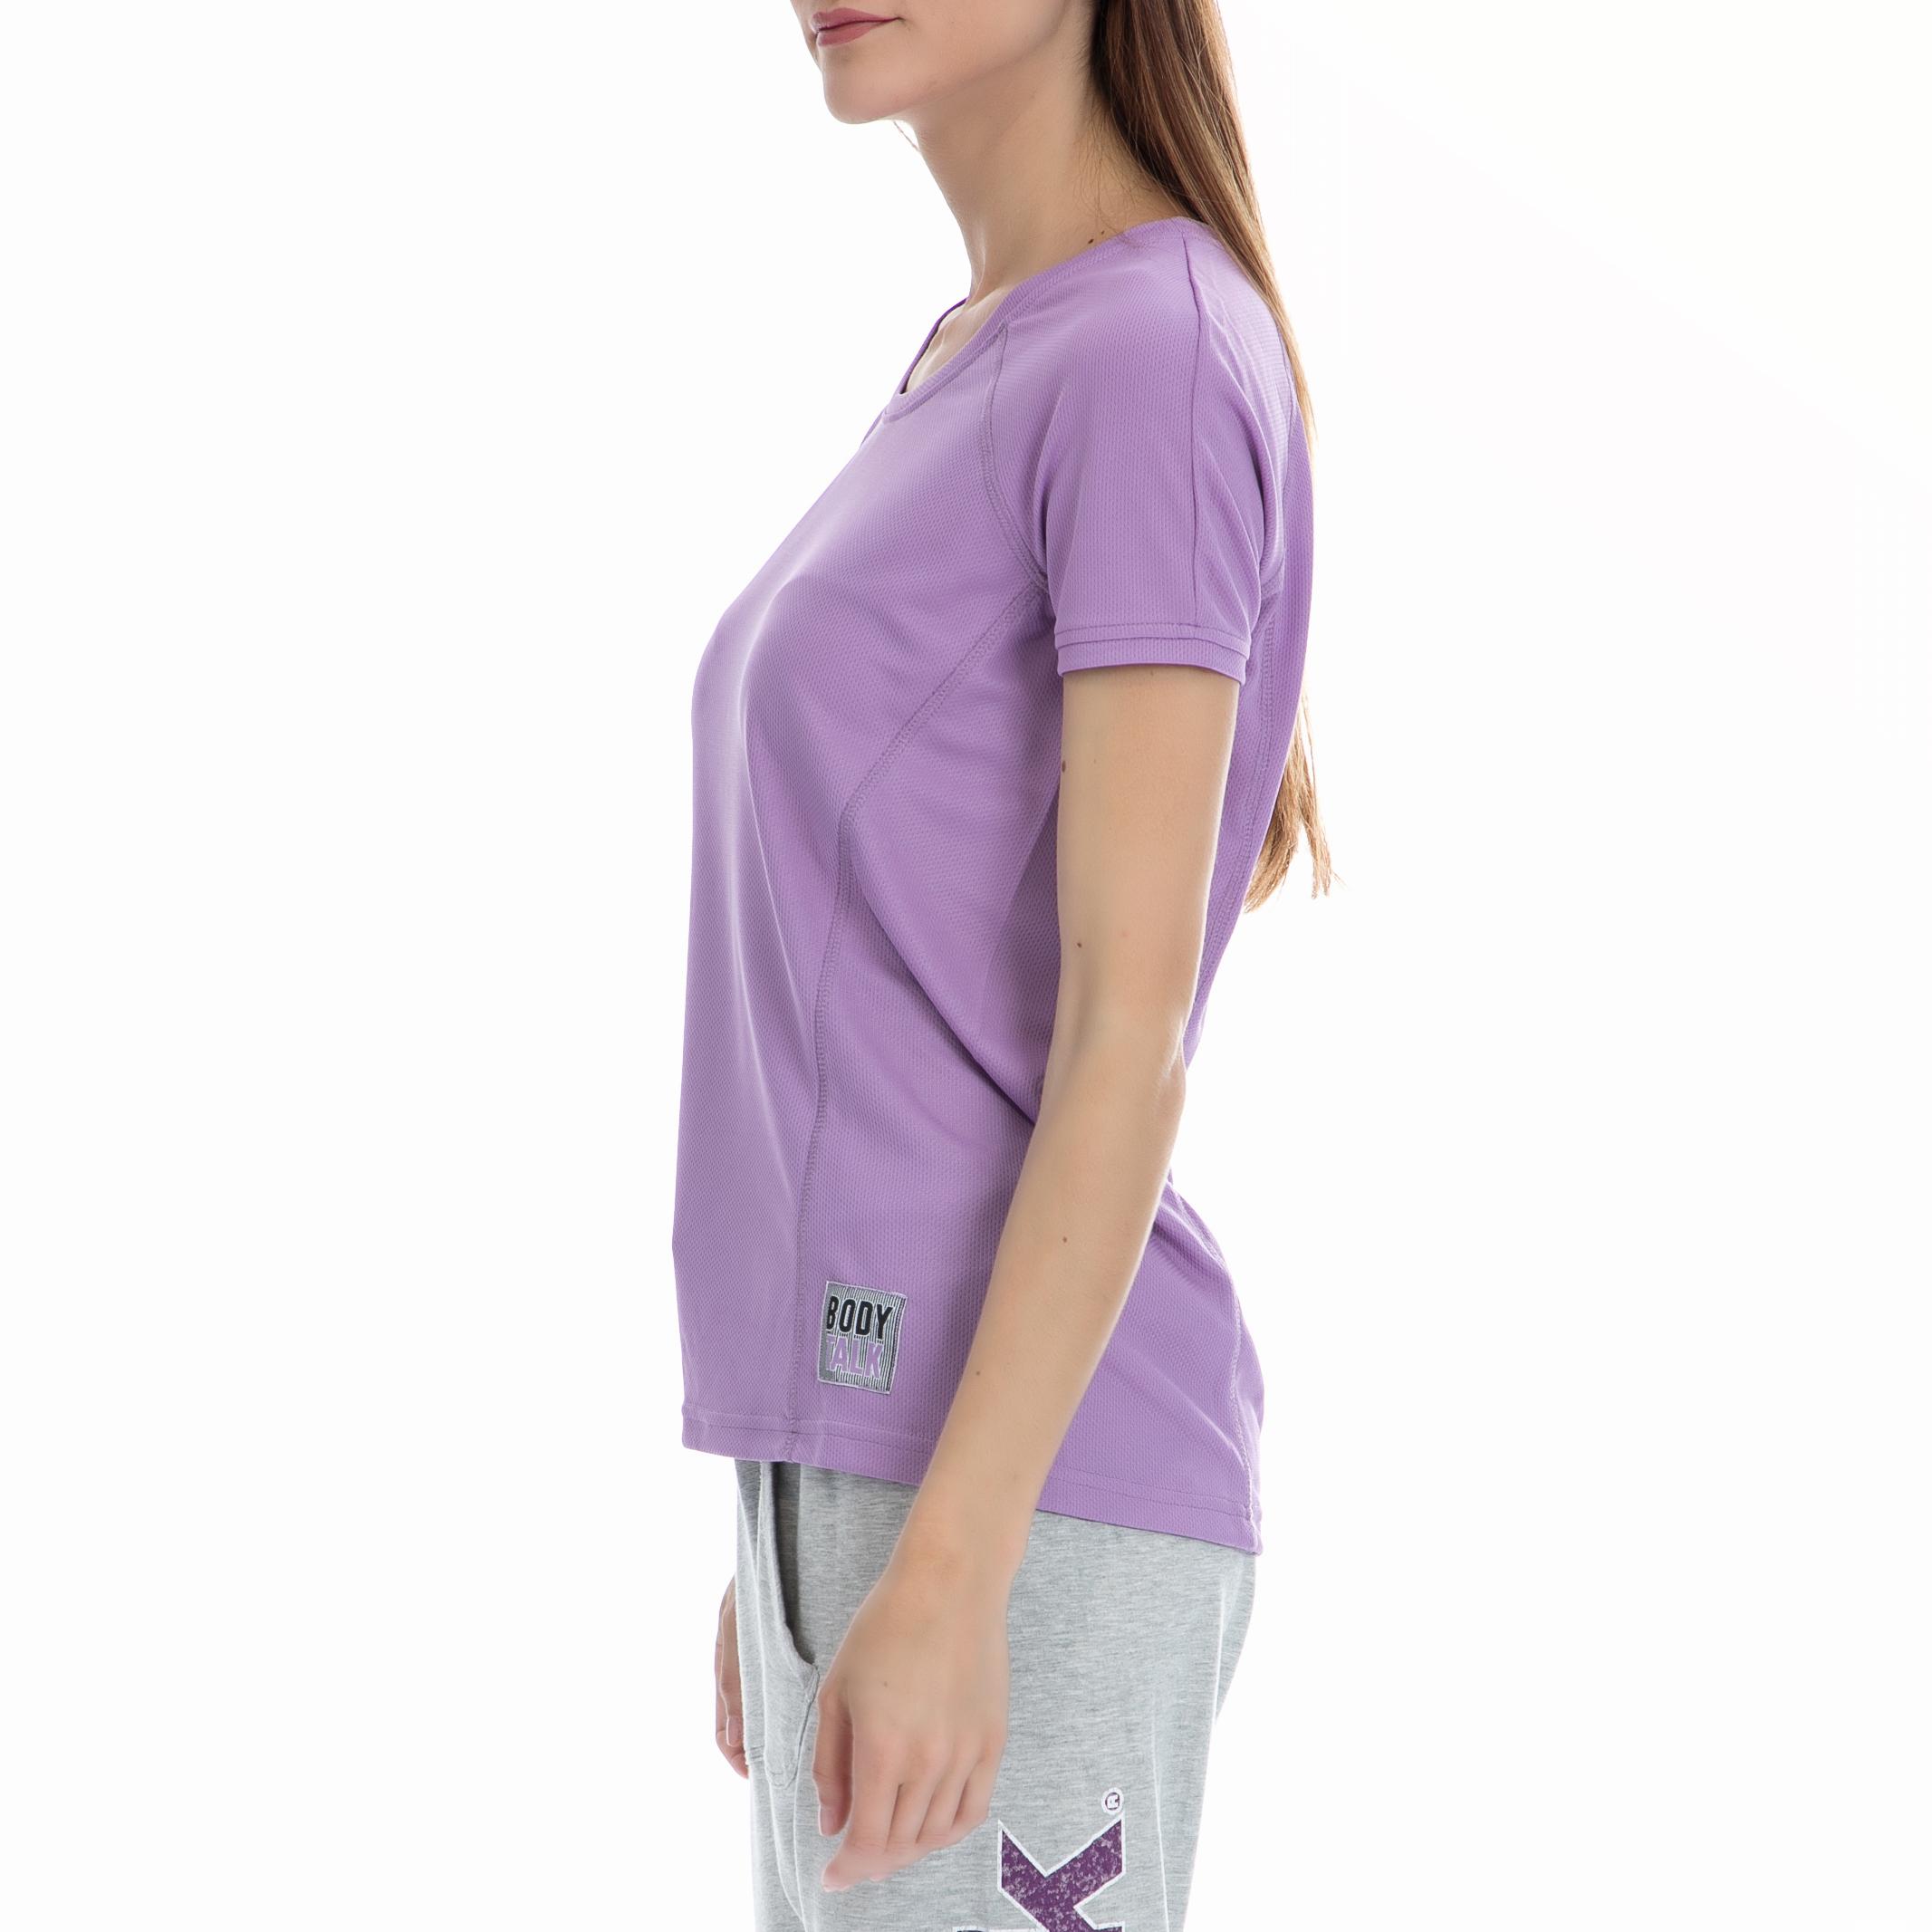 7e10e563c8e0 BODYTALK - Γυναικεία μπλούζα BODYTALK μωβ